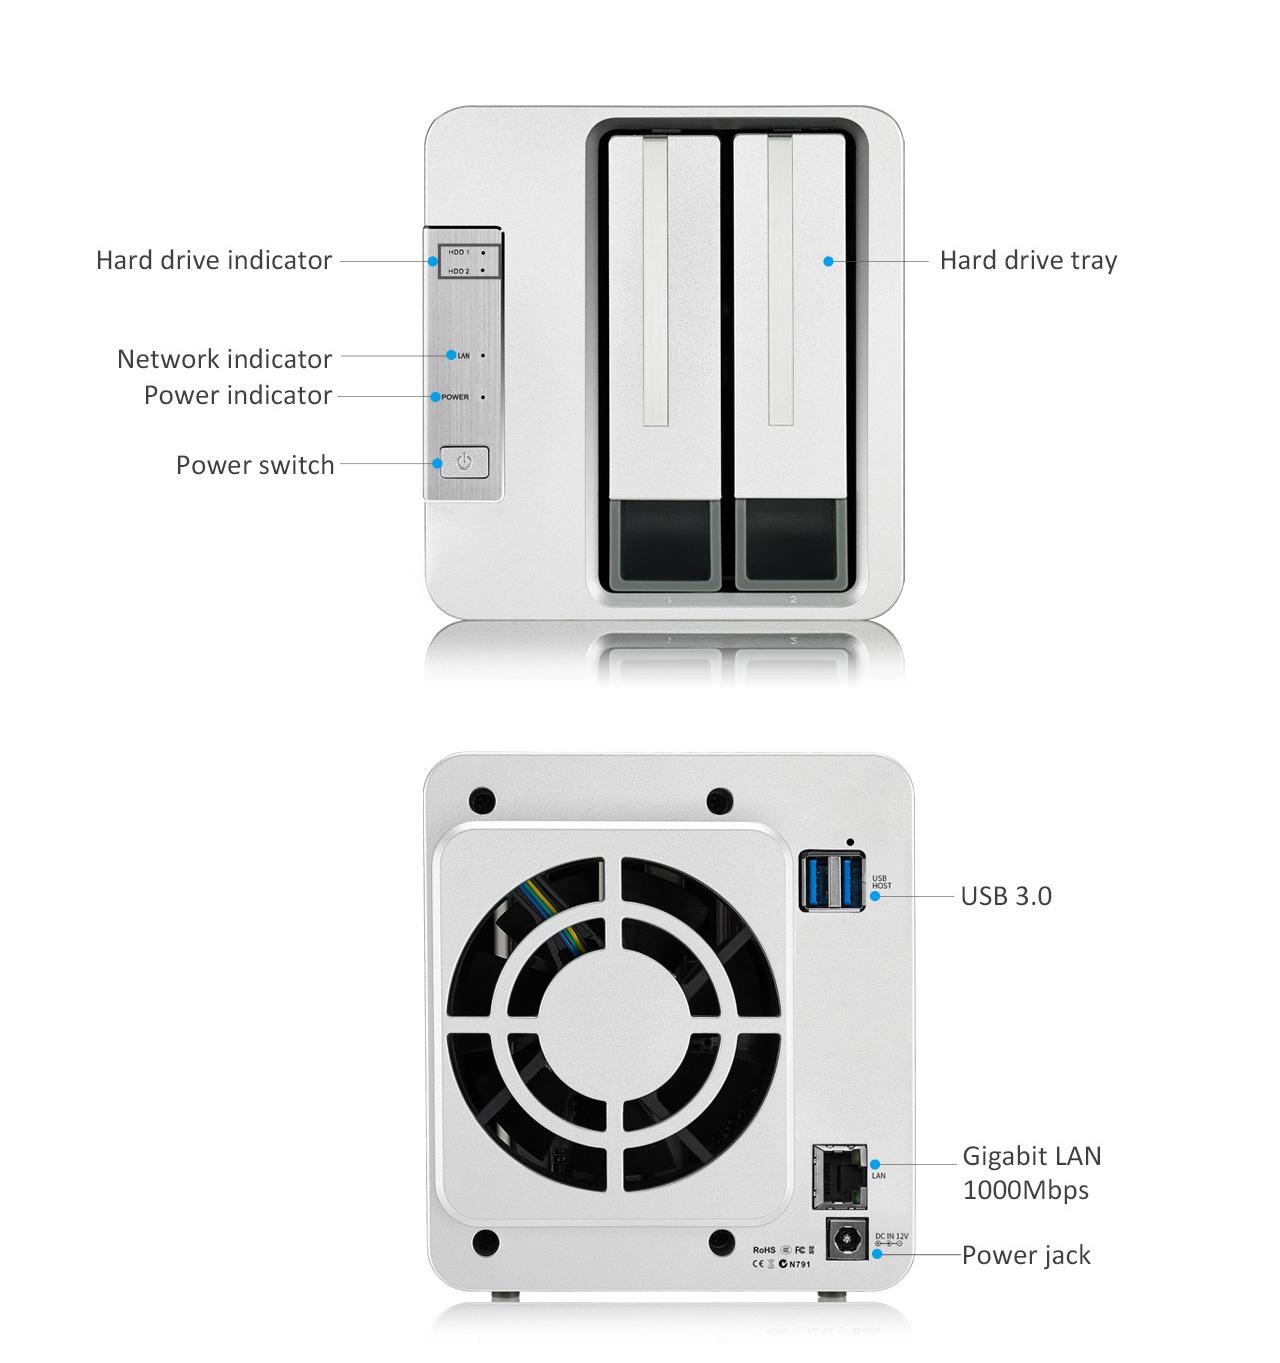 TerraMaster F2-210 2-bay NAS ARM V8 Quad Core 4K Transcoding Media Server $135 + free s/h